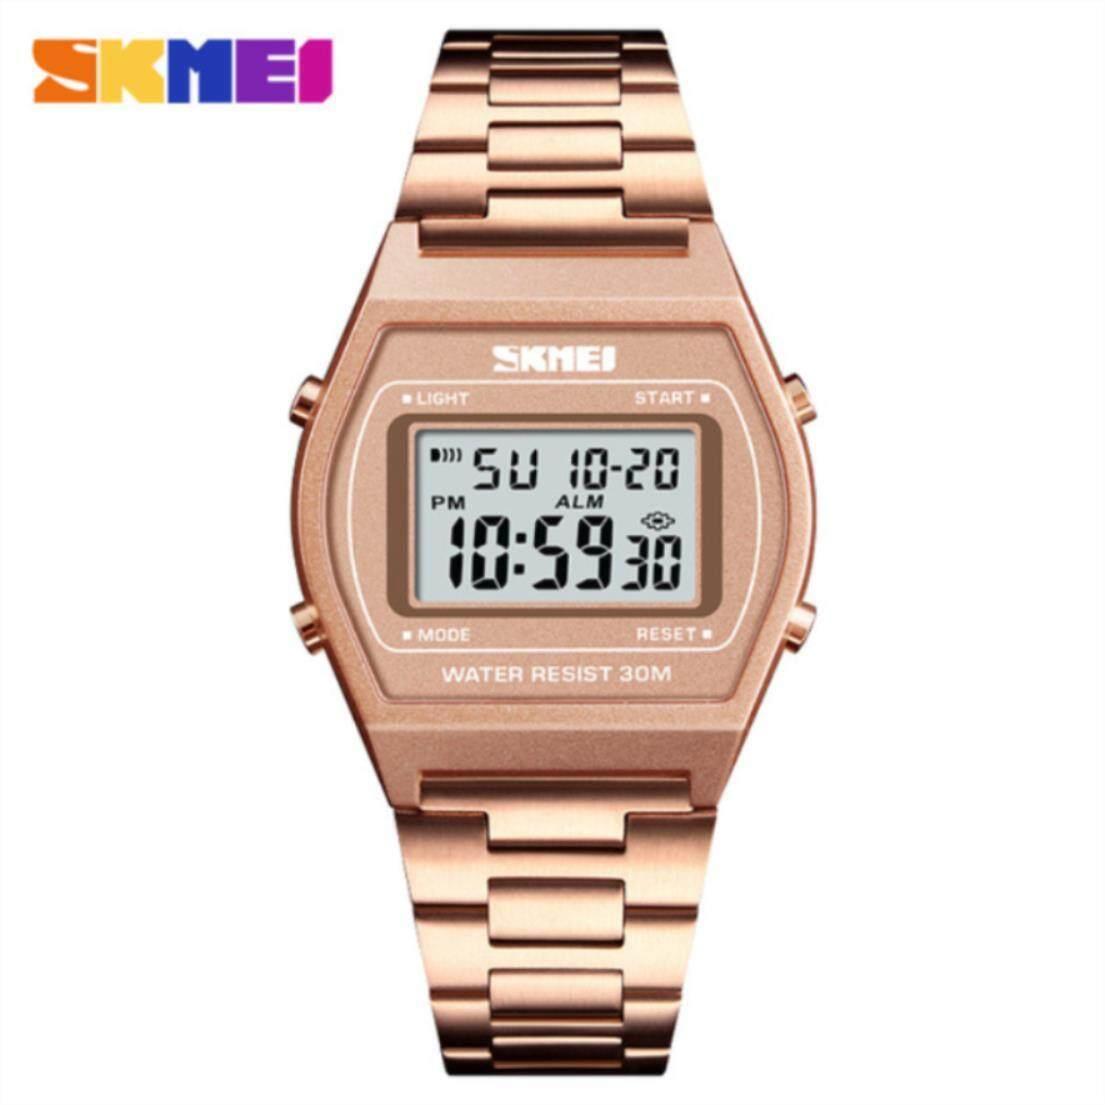 Skmei 1328 ของแท้ 100% ส่งในไทยไวแน่นอน นาฬิกาข้อมือผู้หญิงผู้ชาย สไตล์ Casual Bussiness Watch จับเวลา ตั้งปลุกได้ ไฟ Led ส่องสว่าง Sk-M1328 By Lk Wow.